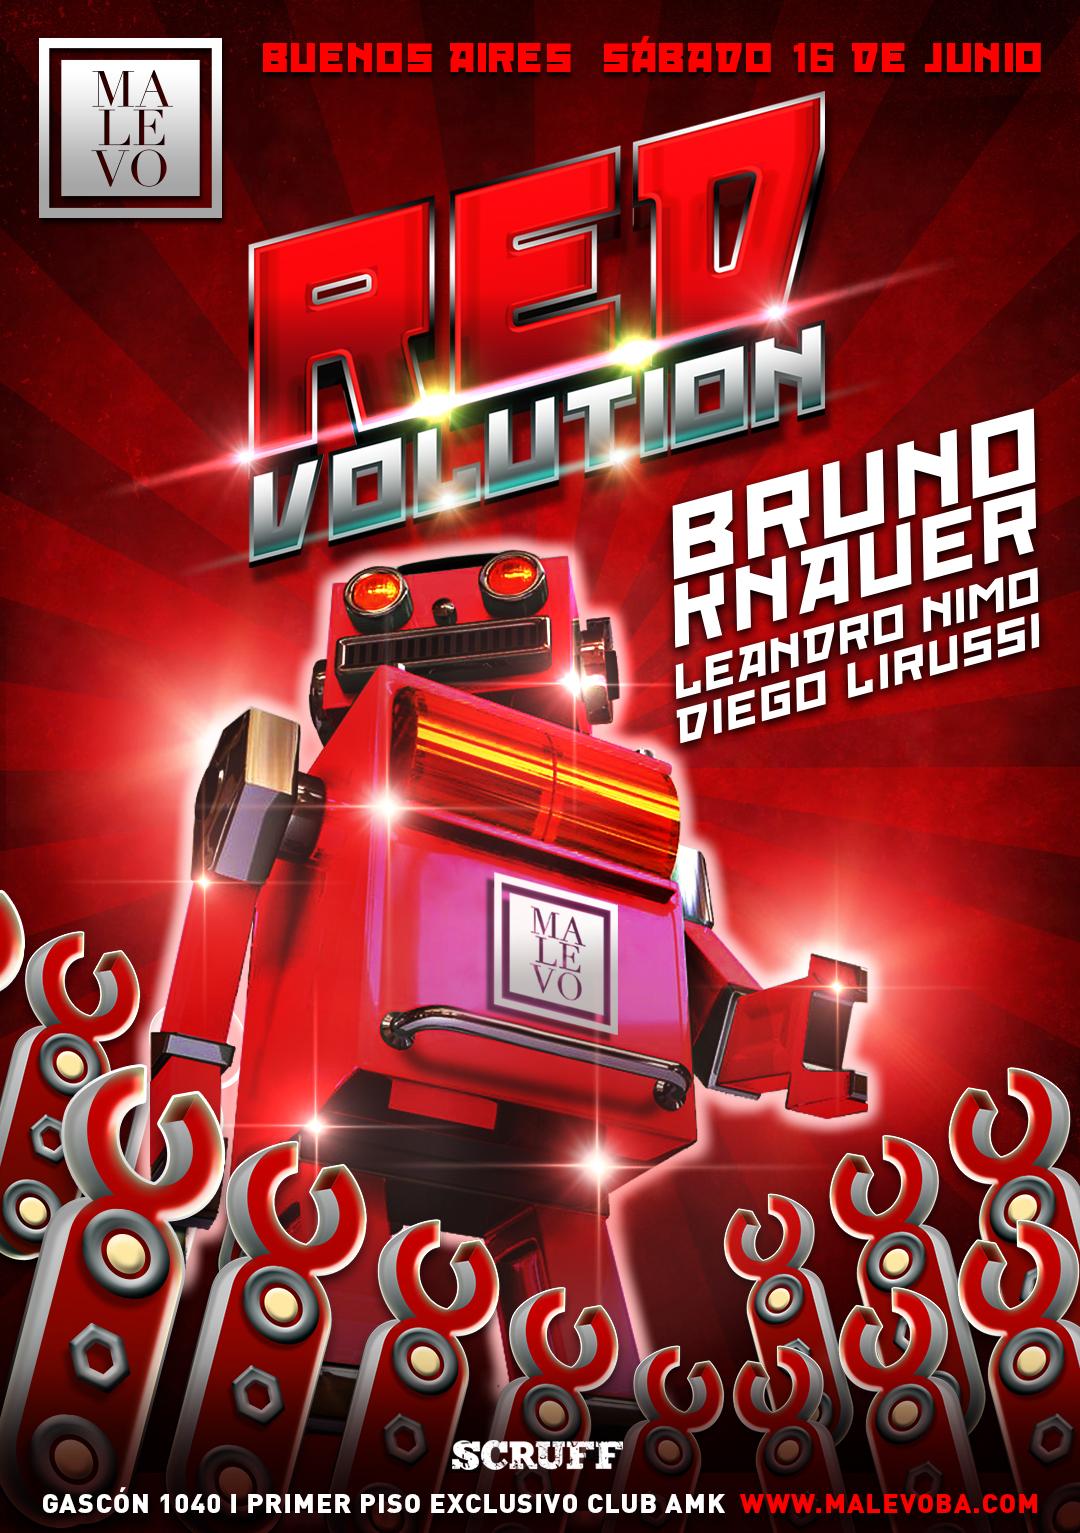 Malevo/Redvolution 16/6/18